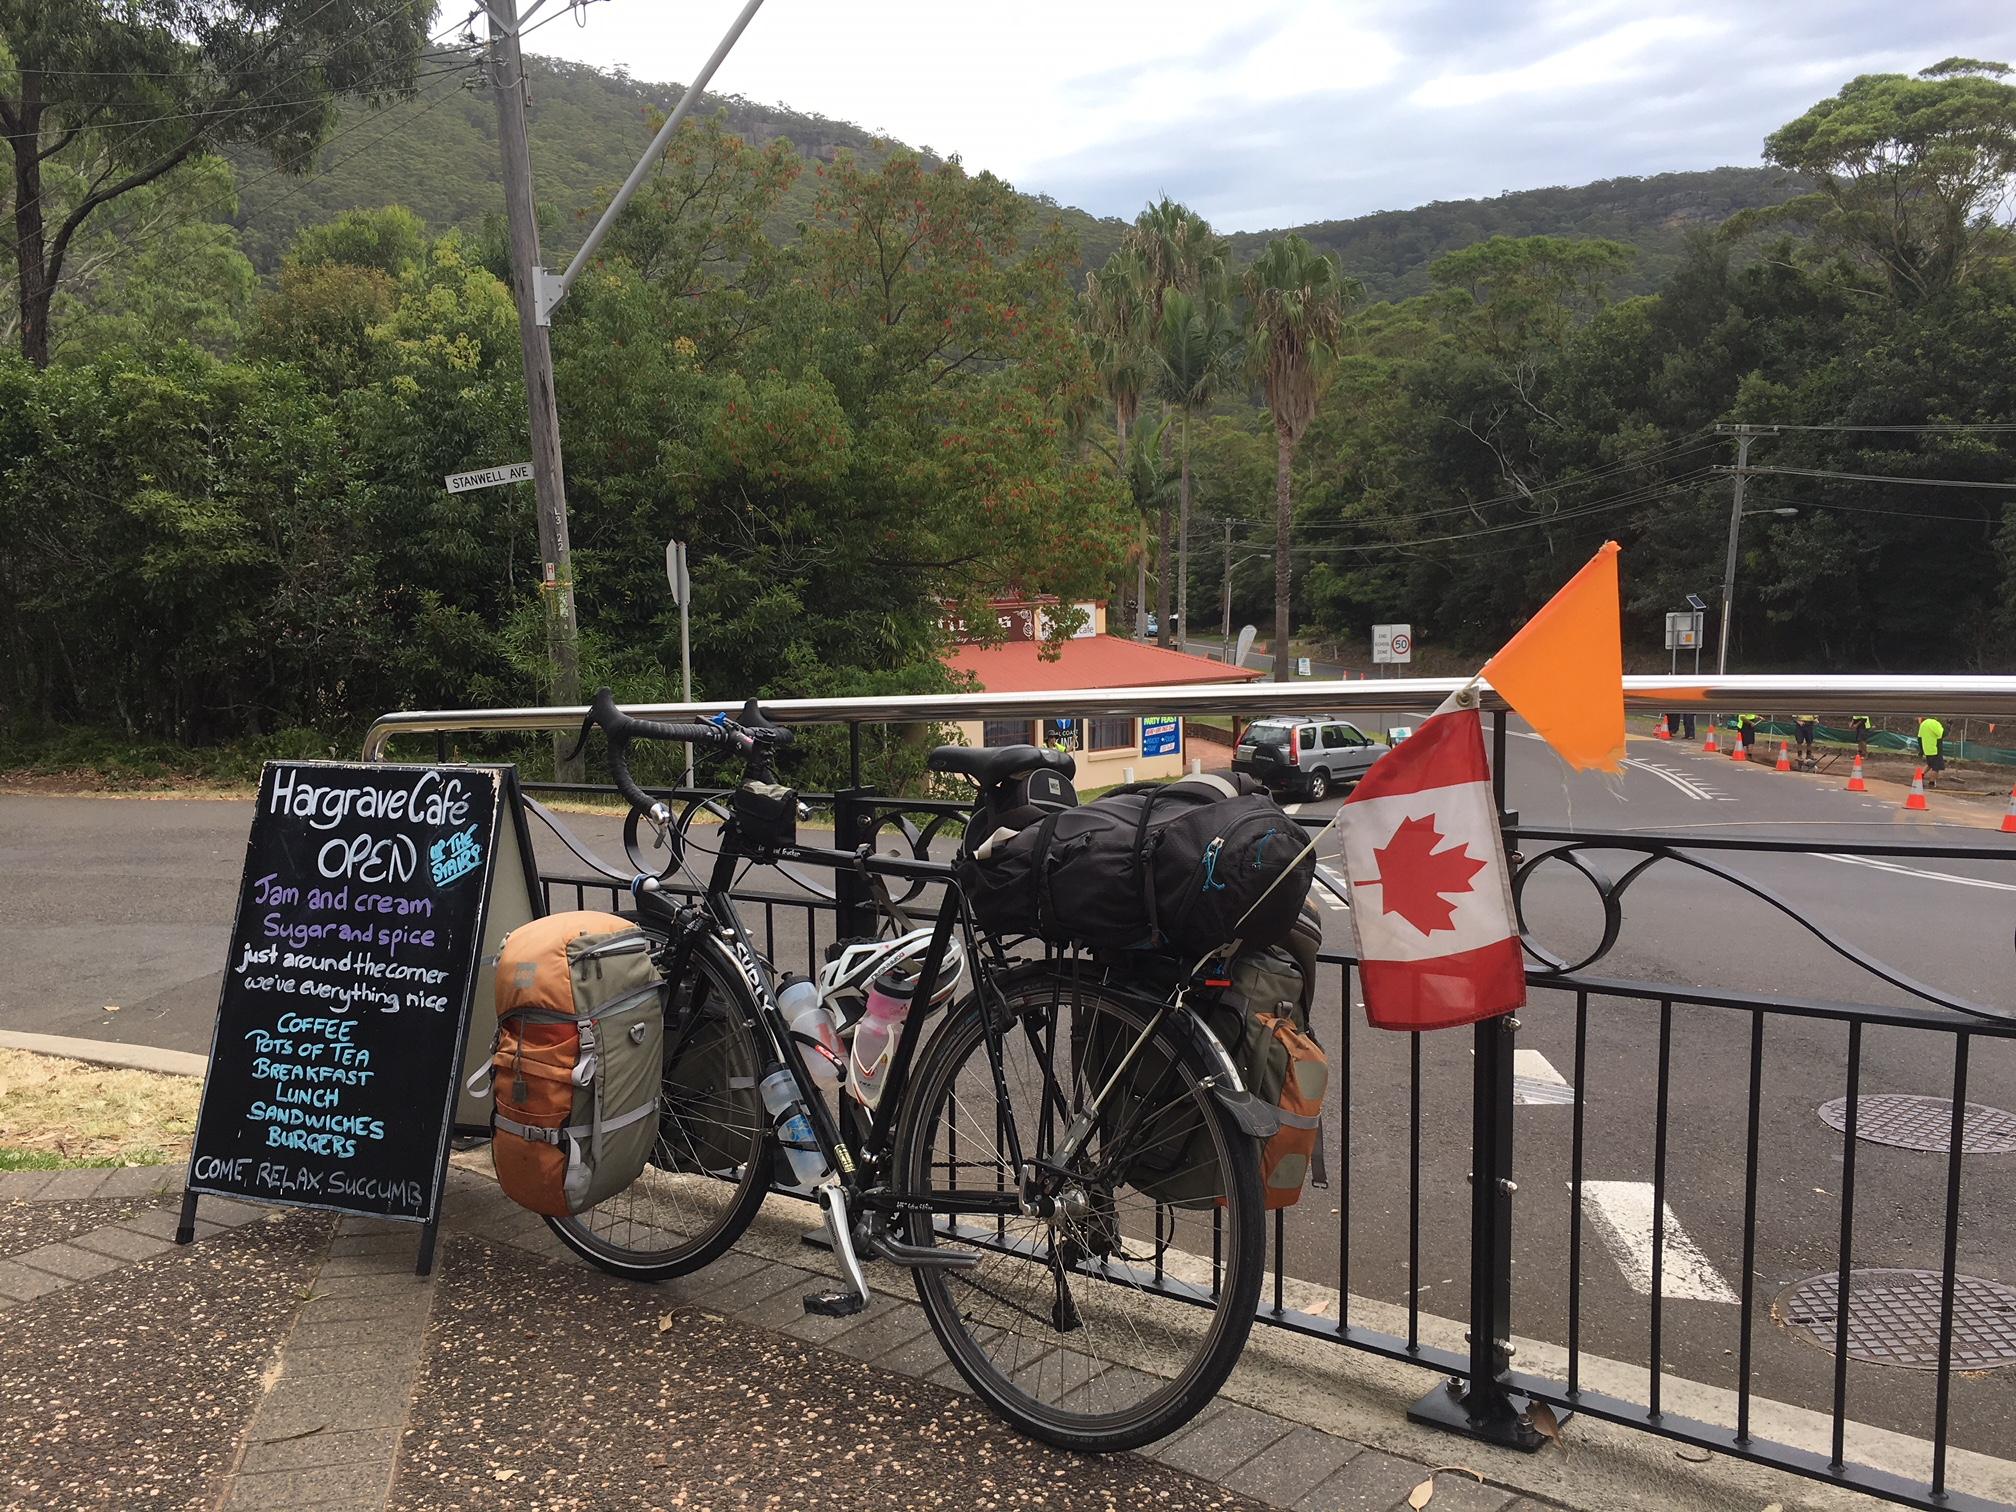 bike at Hargrave cafe.jpg